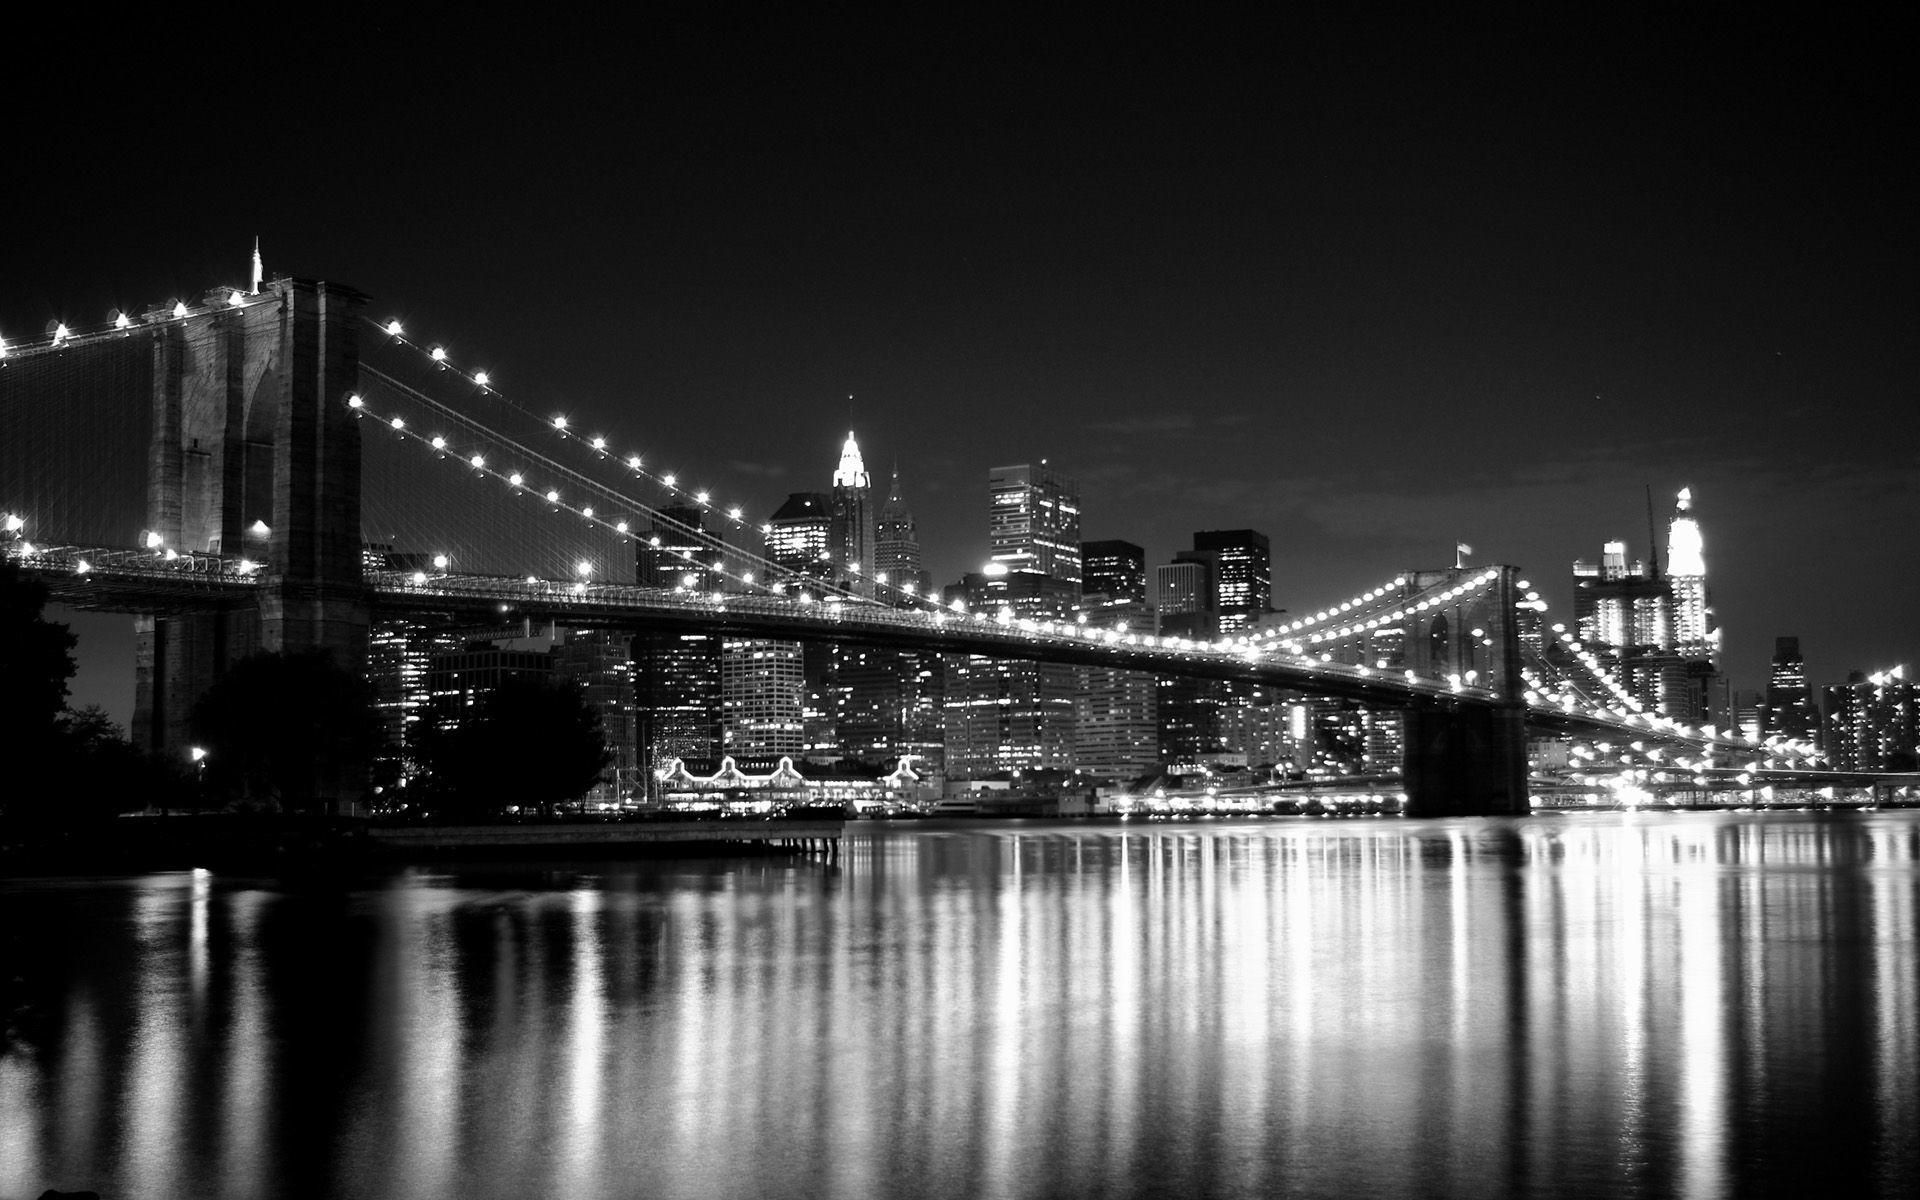 1920x1200 New York City Wallpaper Black And White